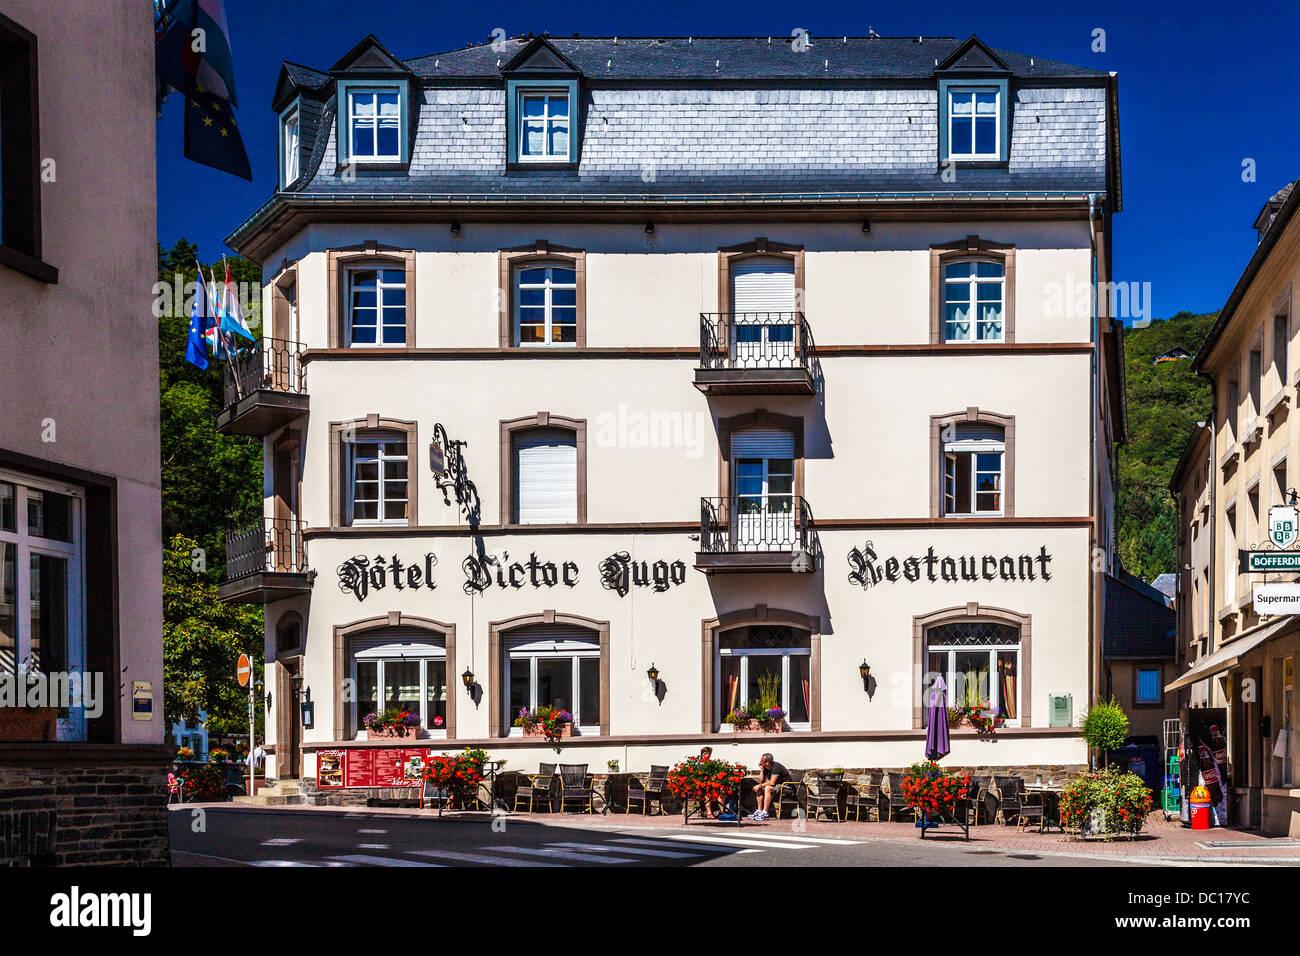 Cafe Victor Hugo Stock Photos & Cafe Victor Hugo Stock Images - Alamy